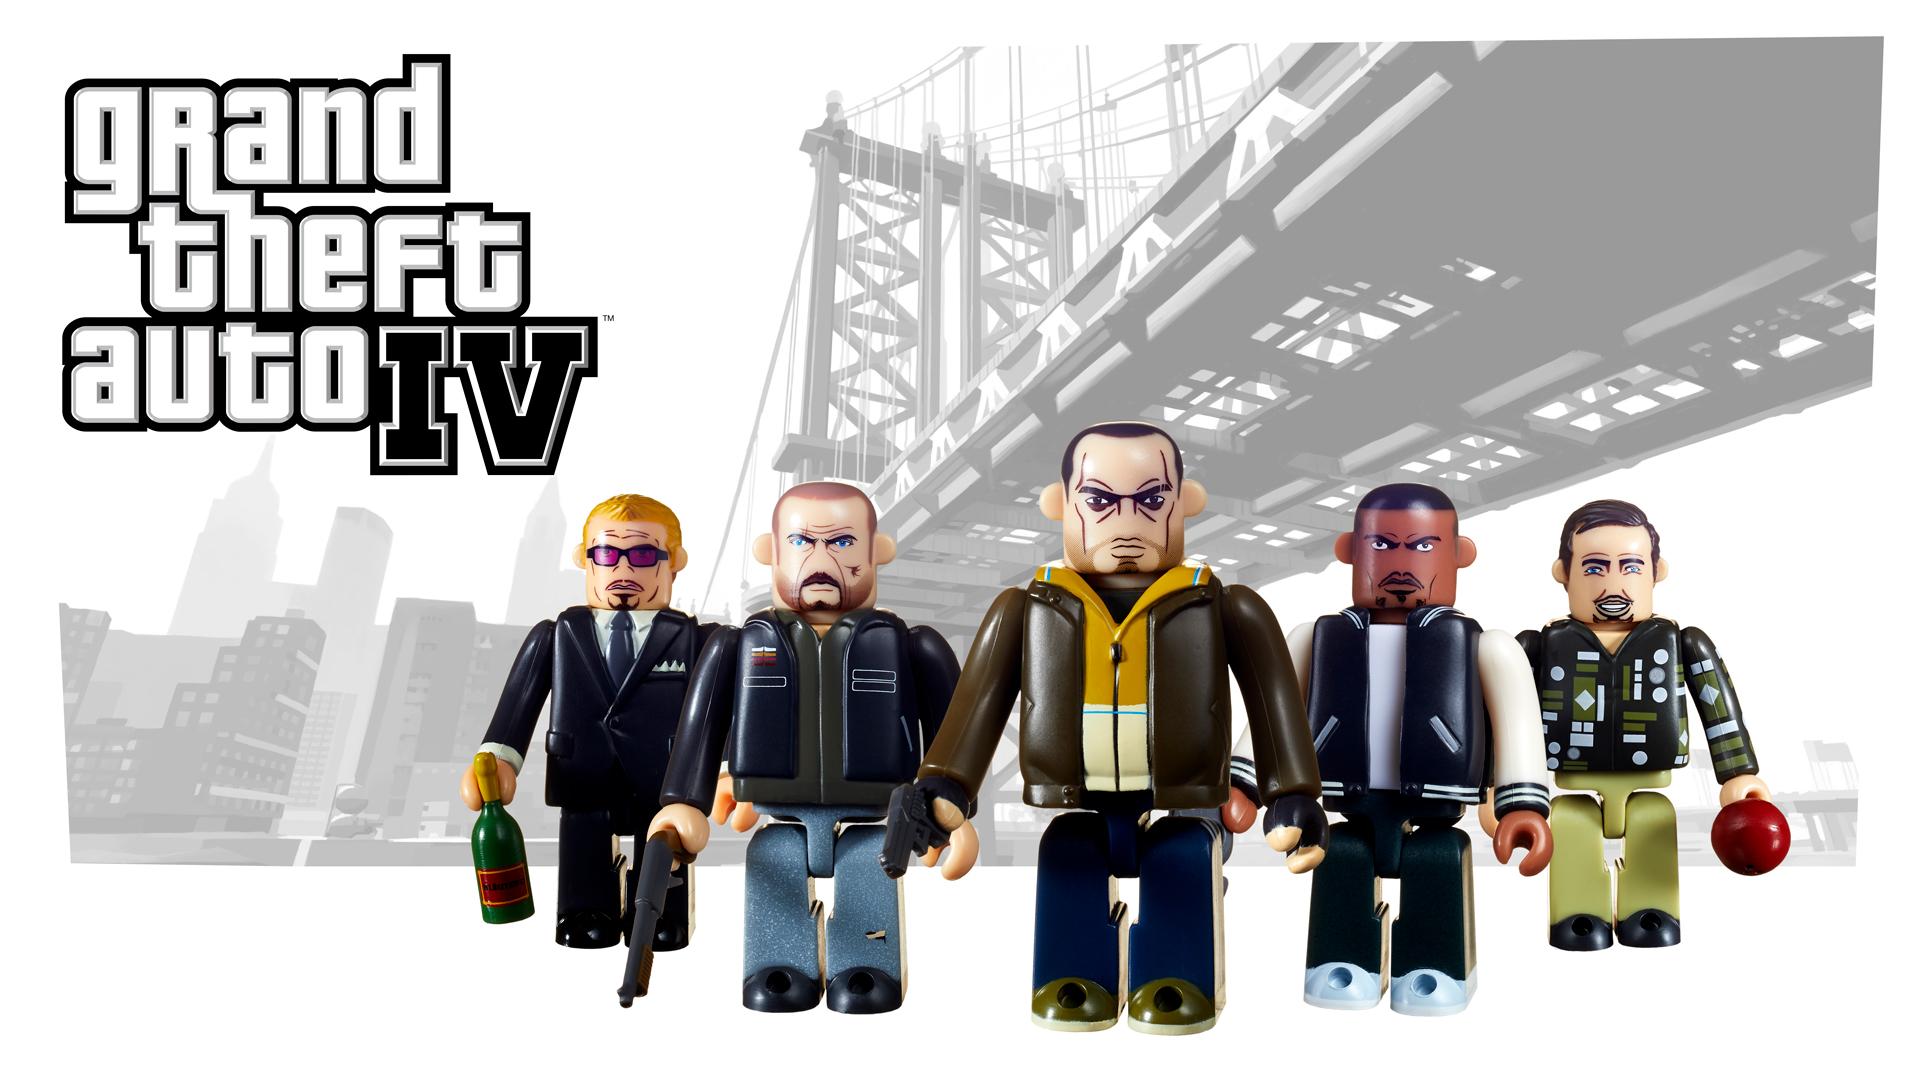 Kubricks Grand Theft Auto IV